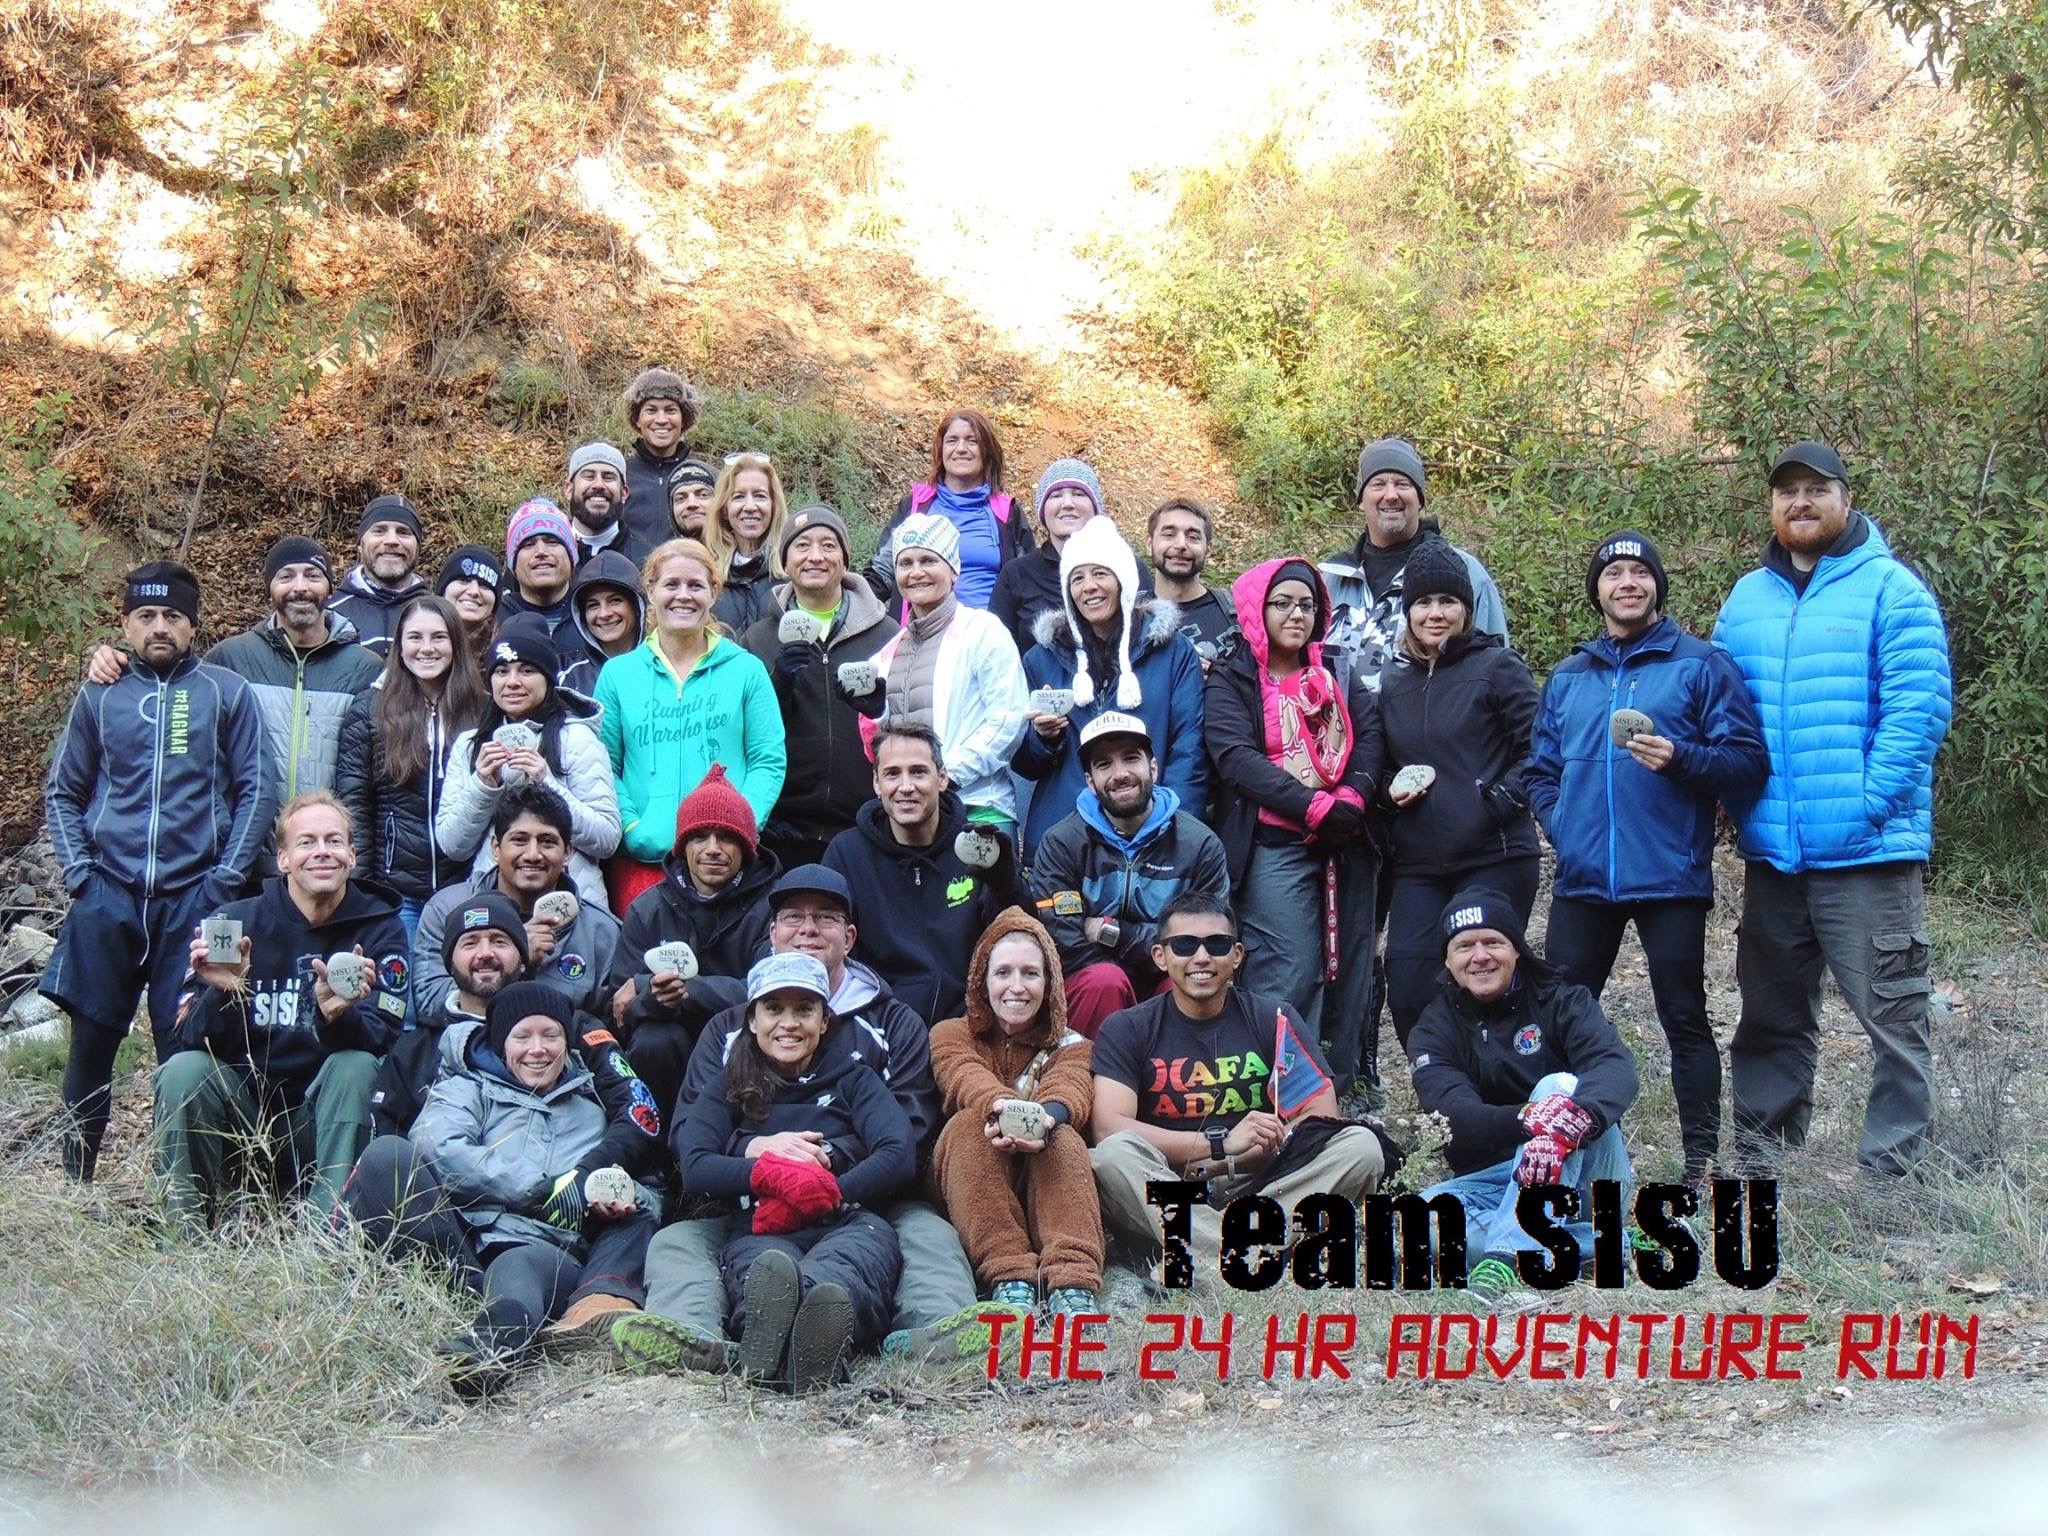 SISU 24 competitors